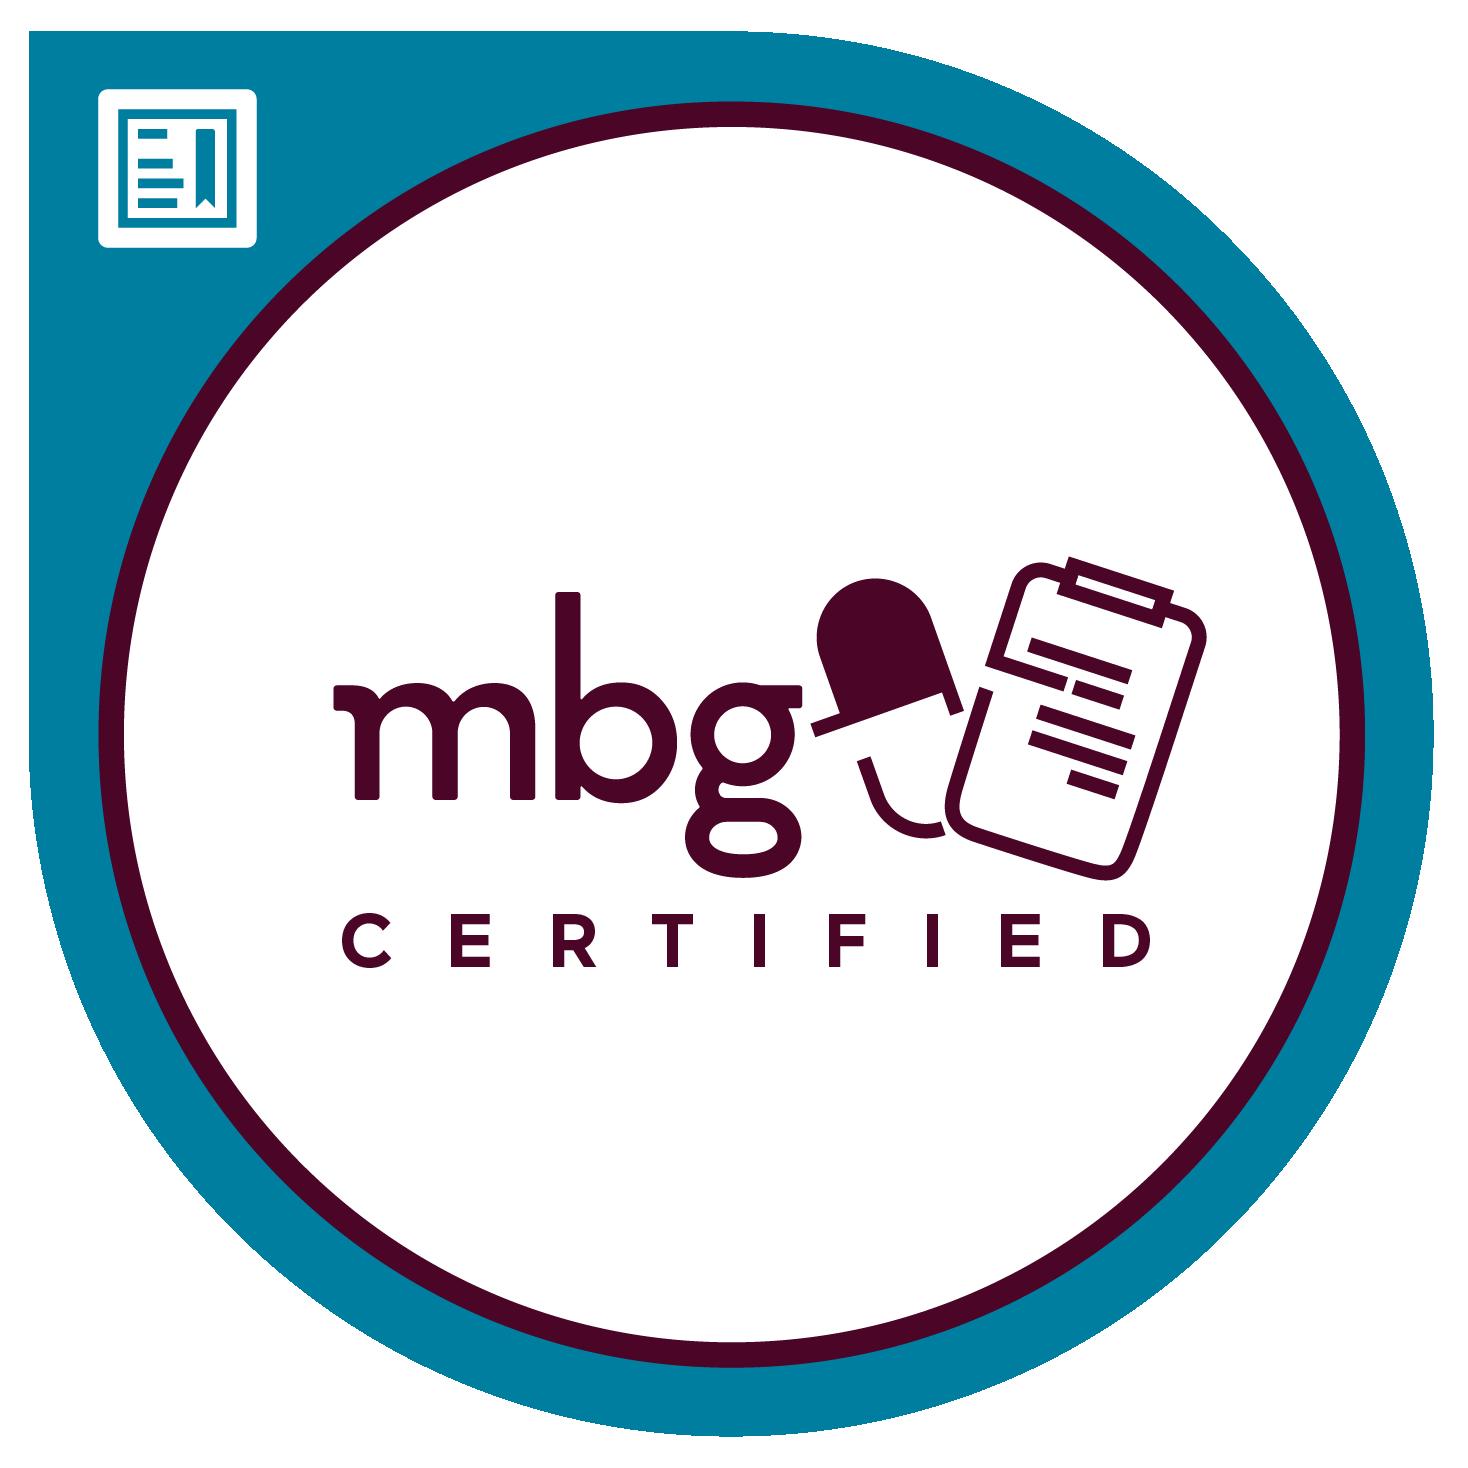 mbg Functional Nutrition Coaching (mbgFNC) Certificate